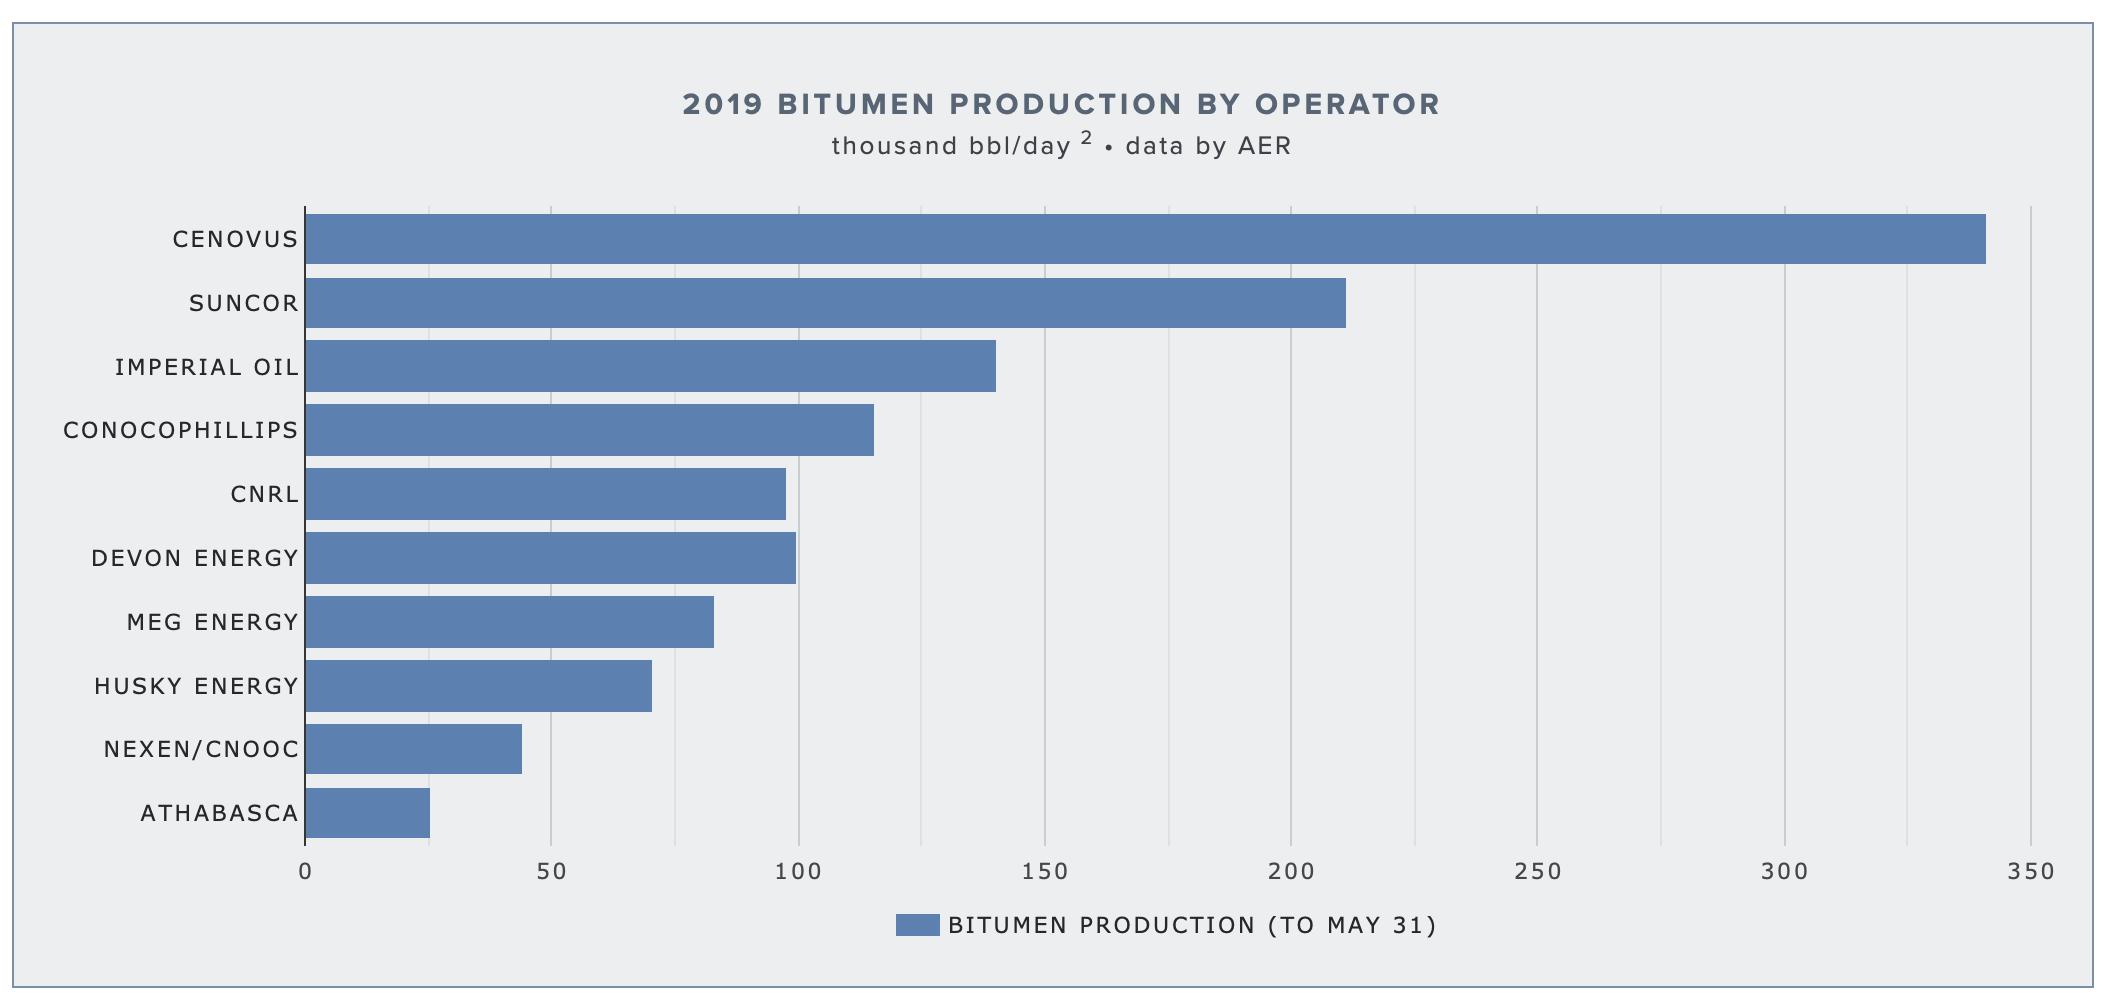 FIRST QUARTER 2019 IN-SITU BITUMEN PRODUCTION RATES